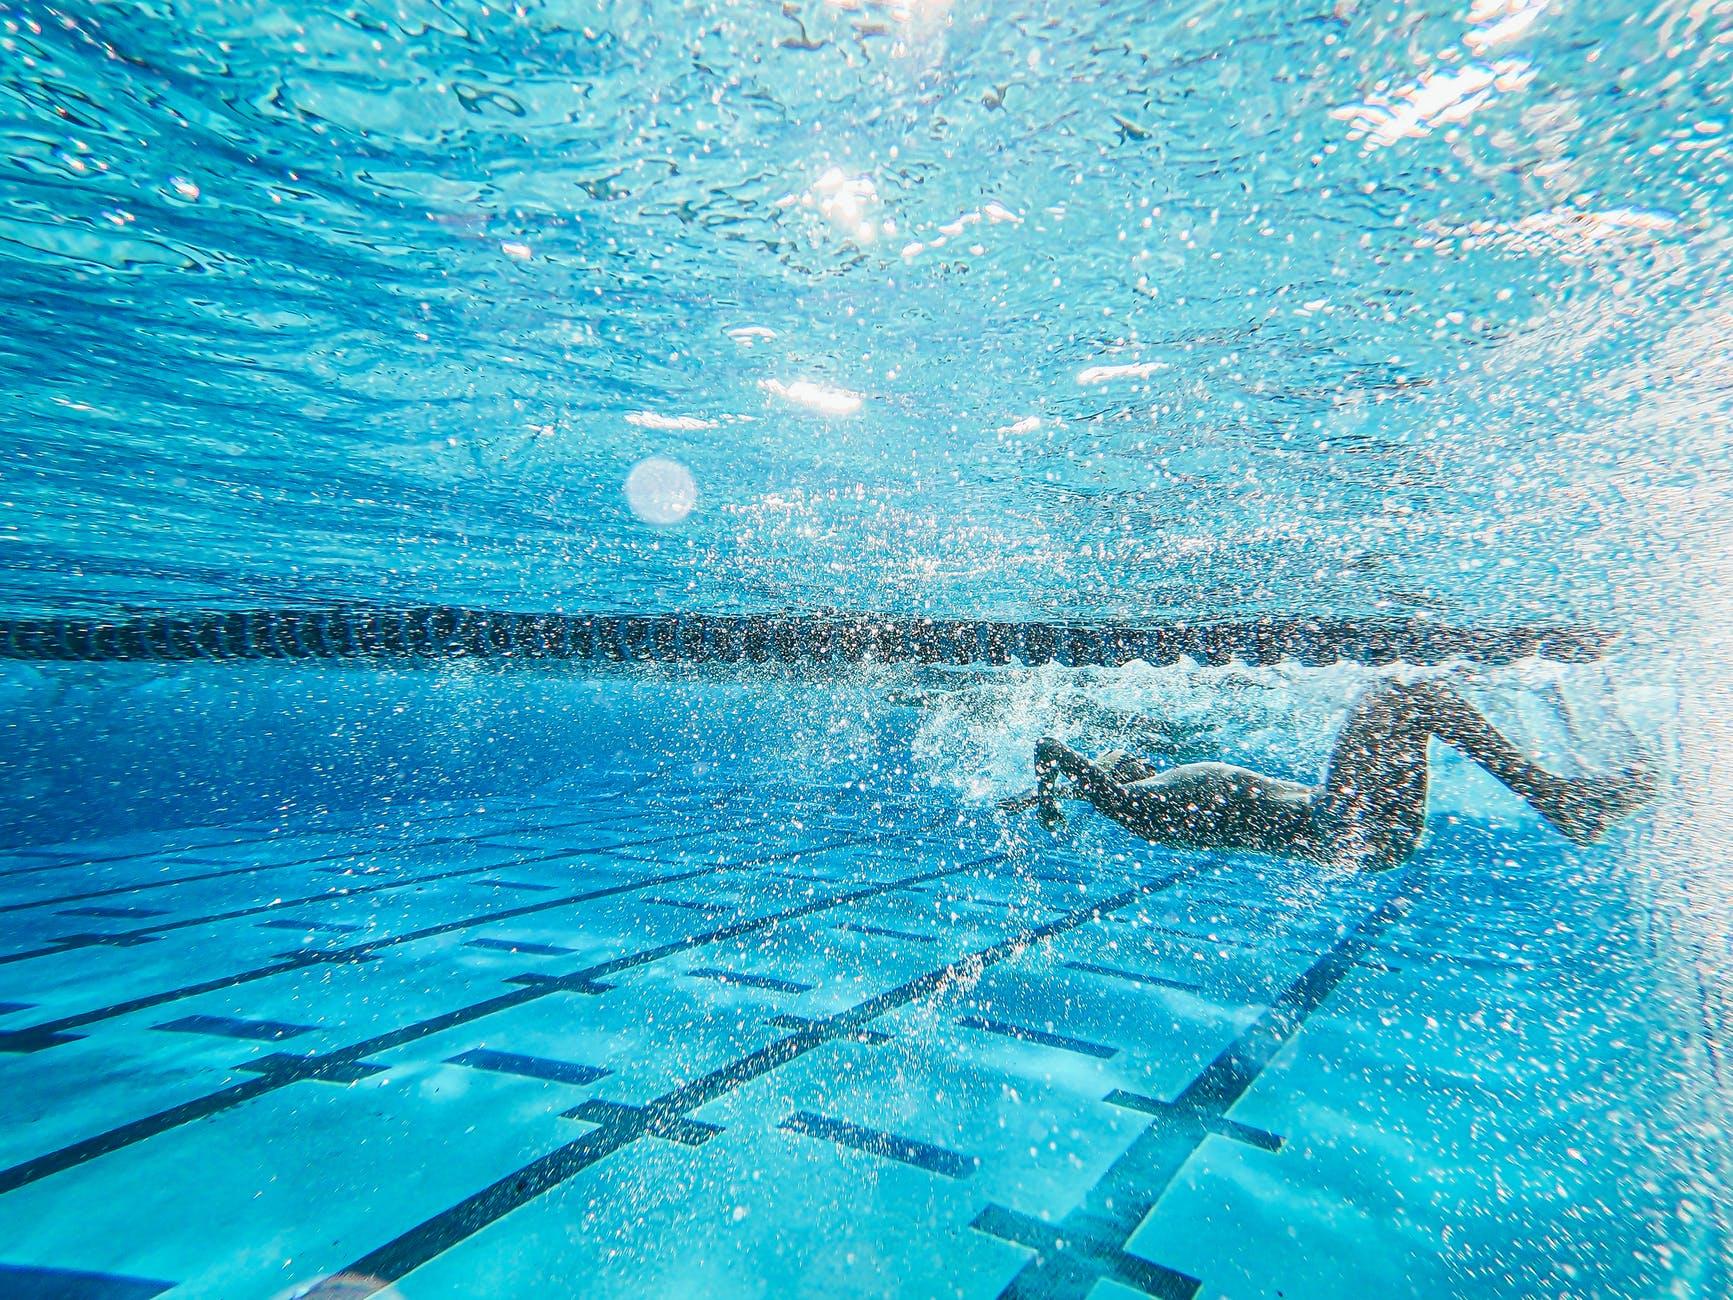 underwater cardio, yescomusa, pool workout